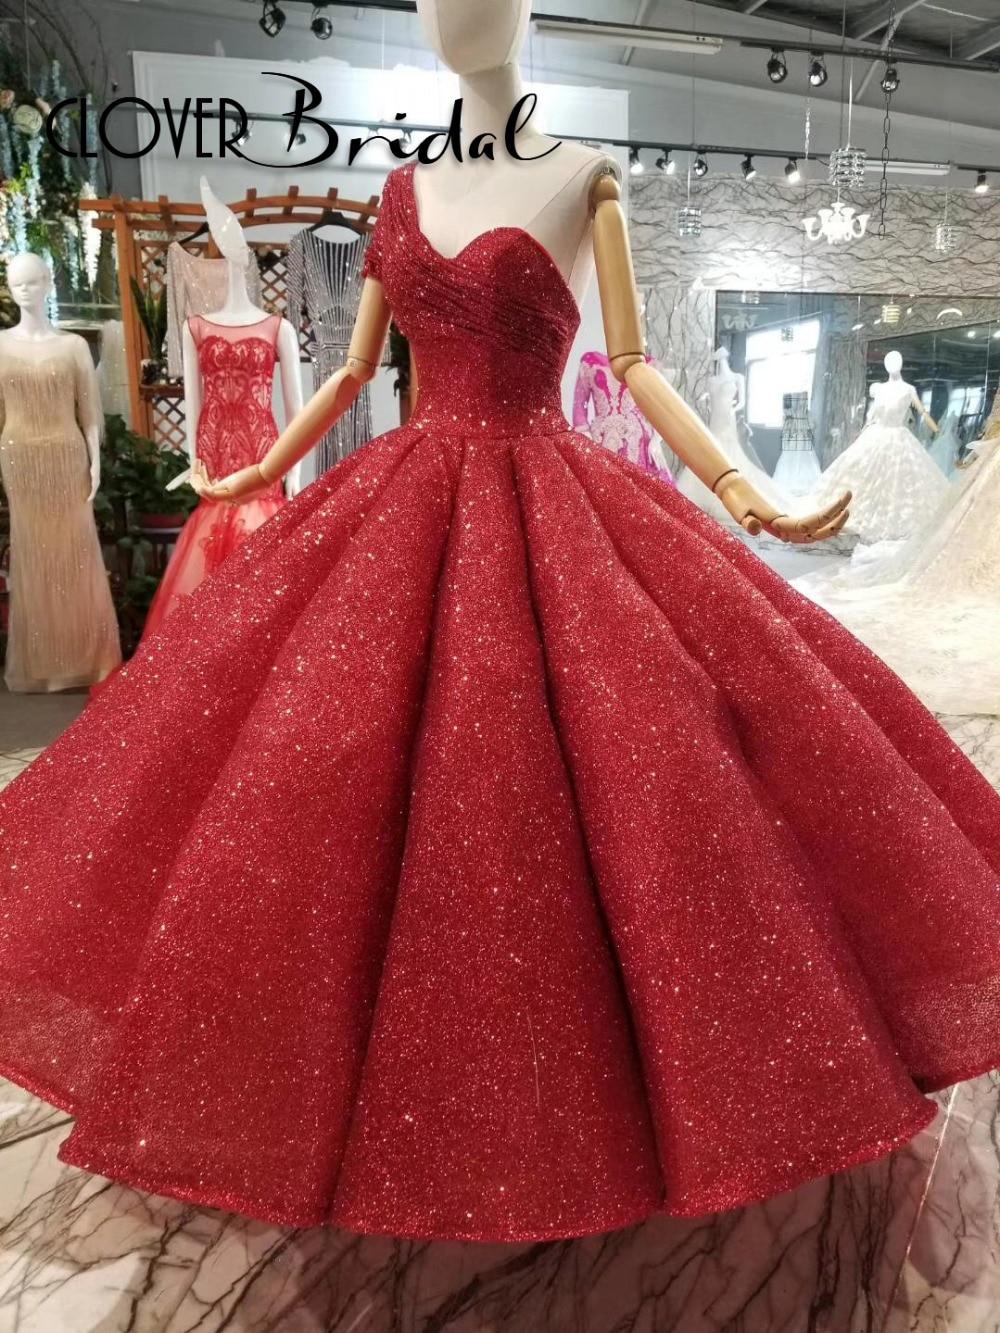 CloverBridal 2018 one shoulder ruches big skirt sequin bling bling red long ball dress for girls corset back sweet 16 gown